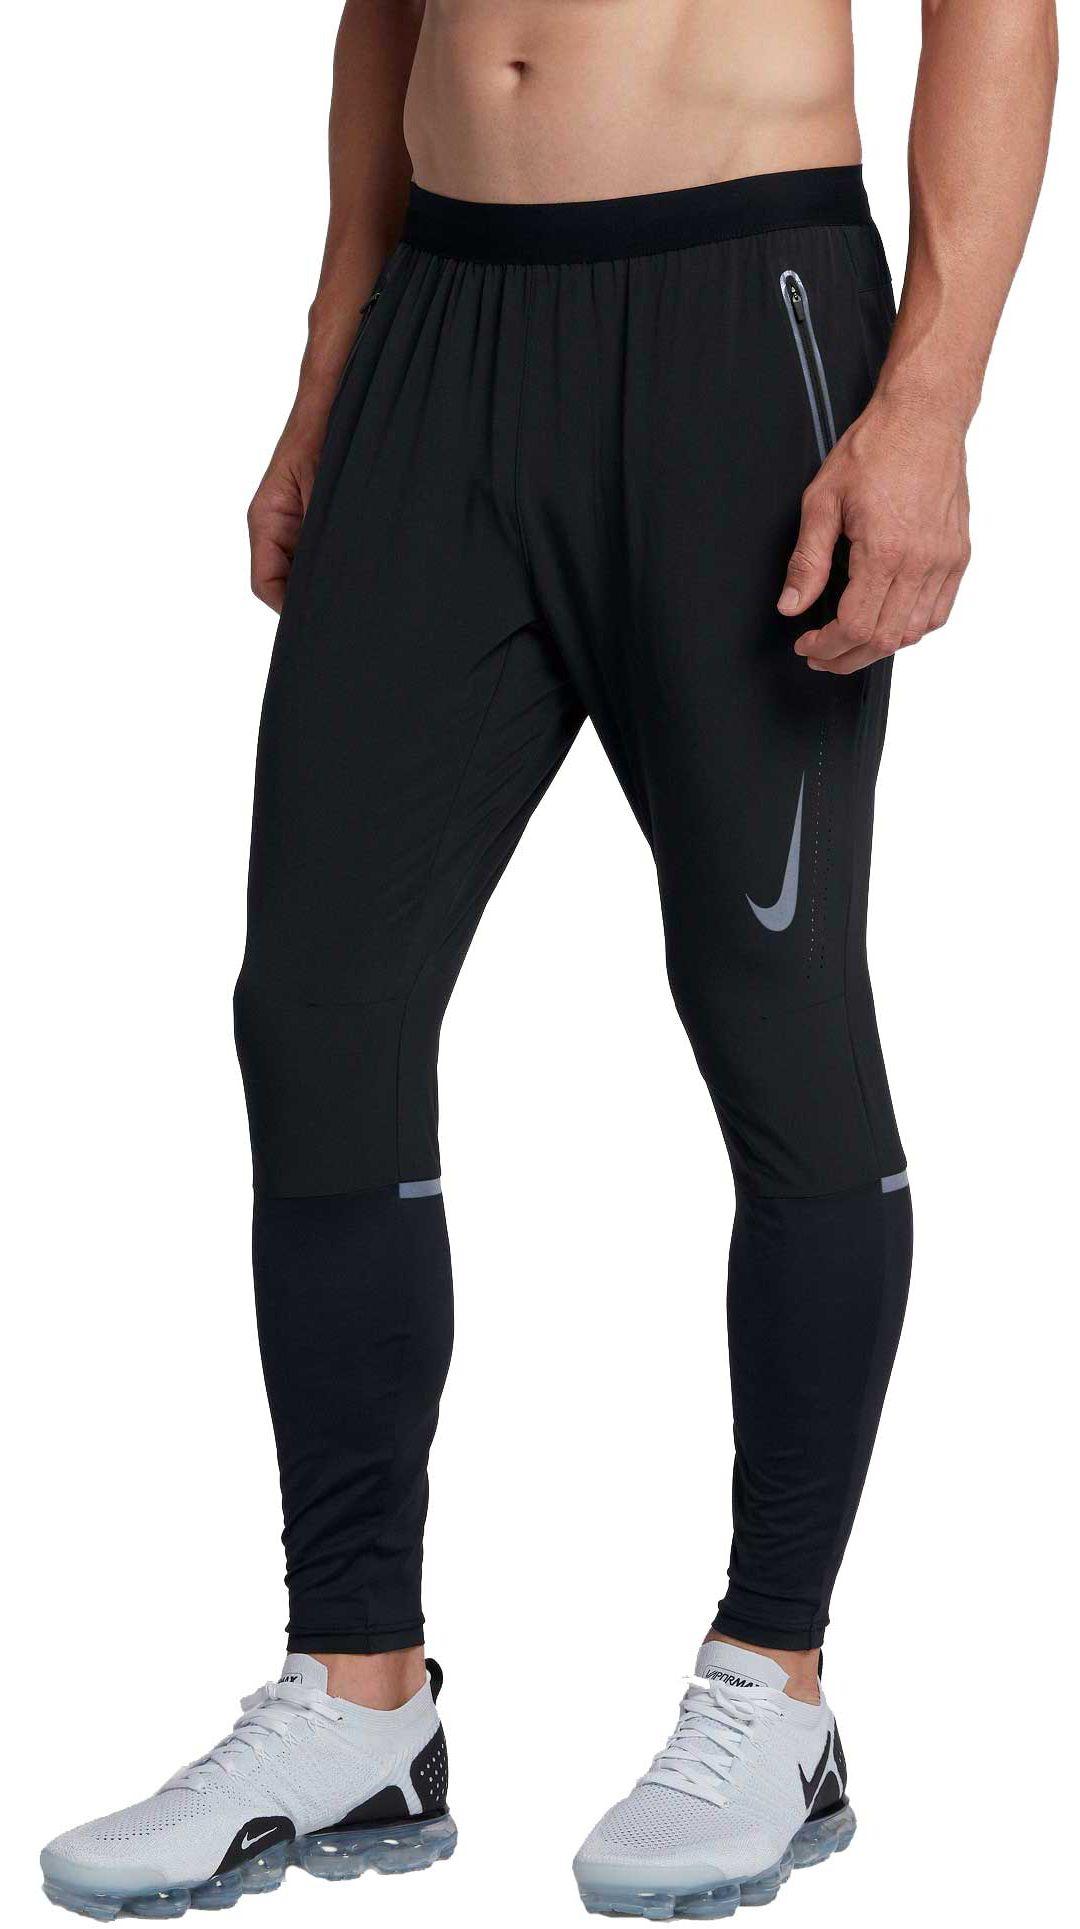 4e526915c1754 Nike Men's Swift Dri-FIT Running Pants   DICK'S Sporting Goods